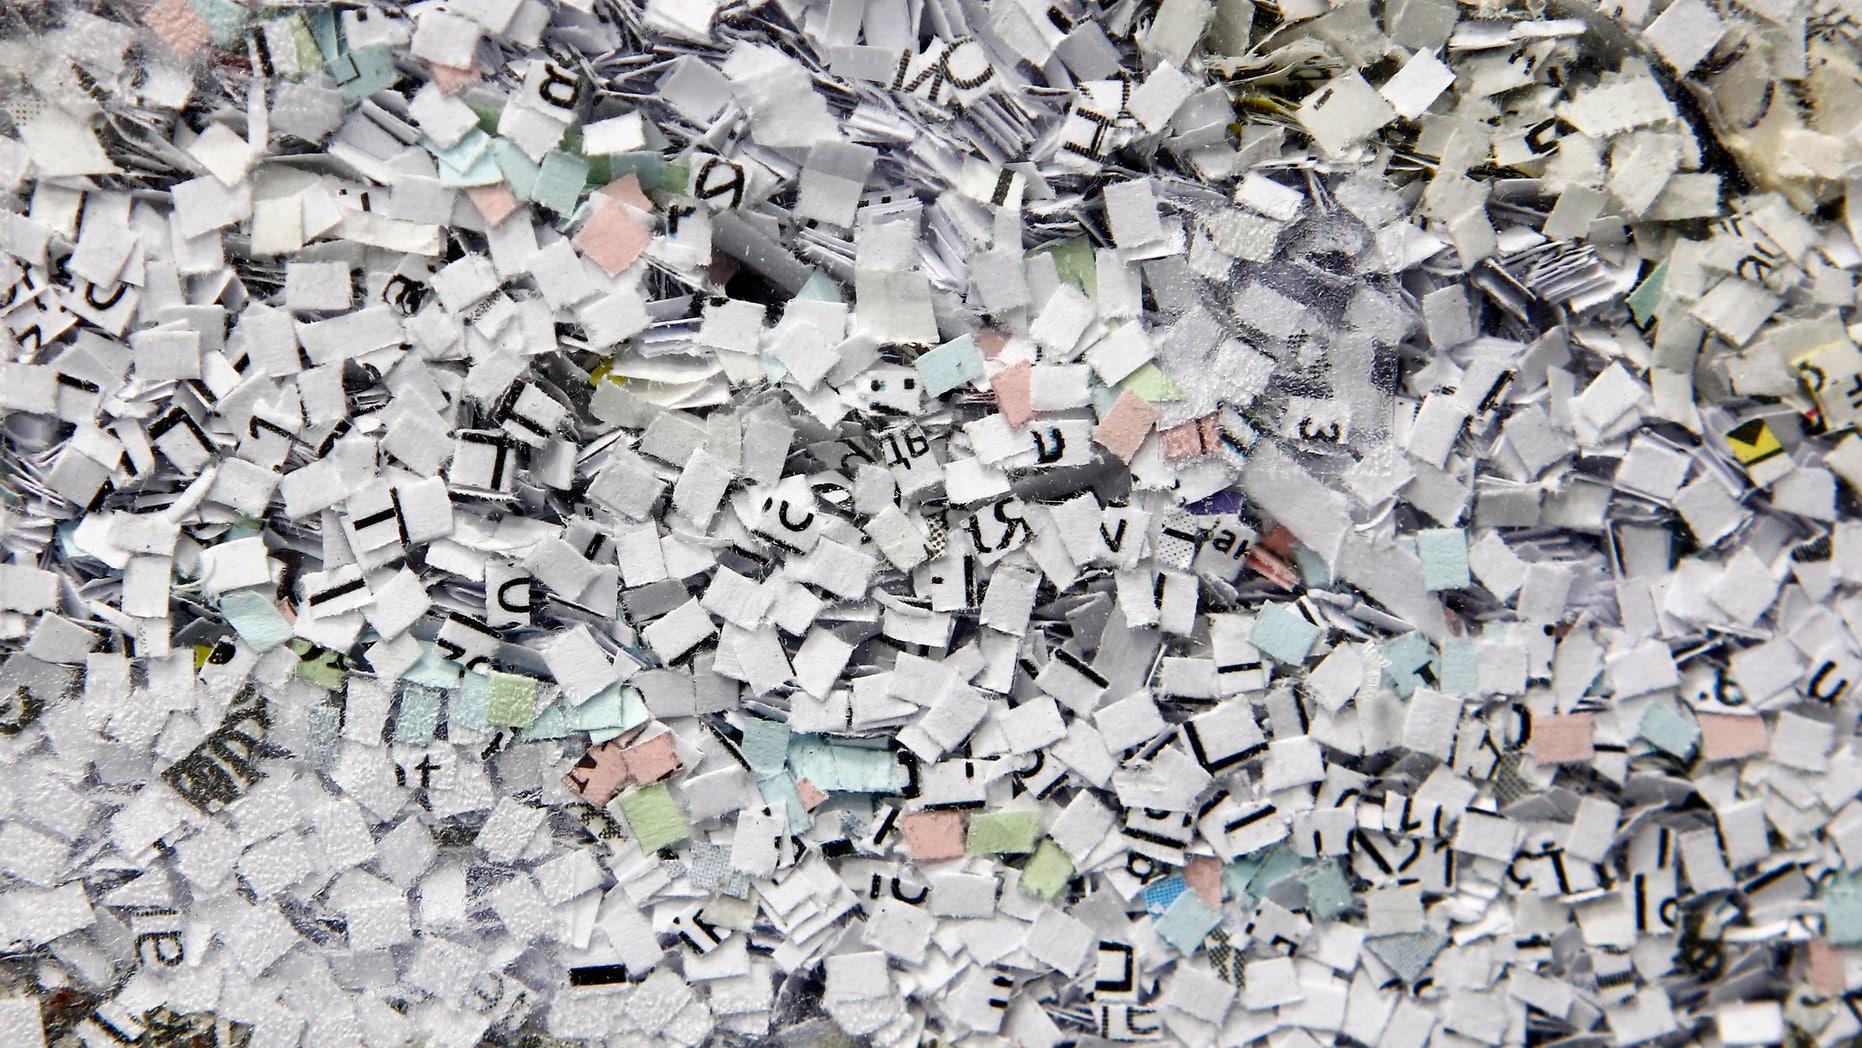 Shredded documents are seen in an office shredder in Kiev March 28, 2012.  REUTERS/Gleb Garanich (UKRAINE  - Tags: SOCIETY) - RTR300TU